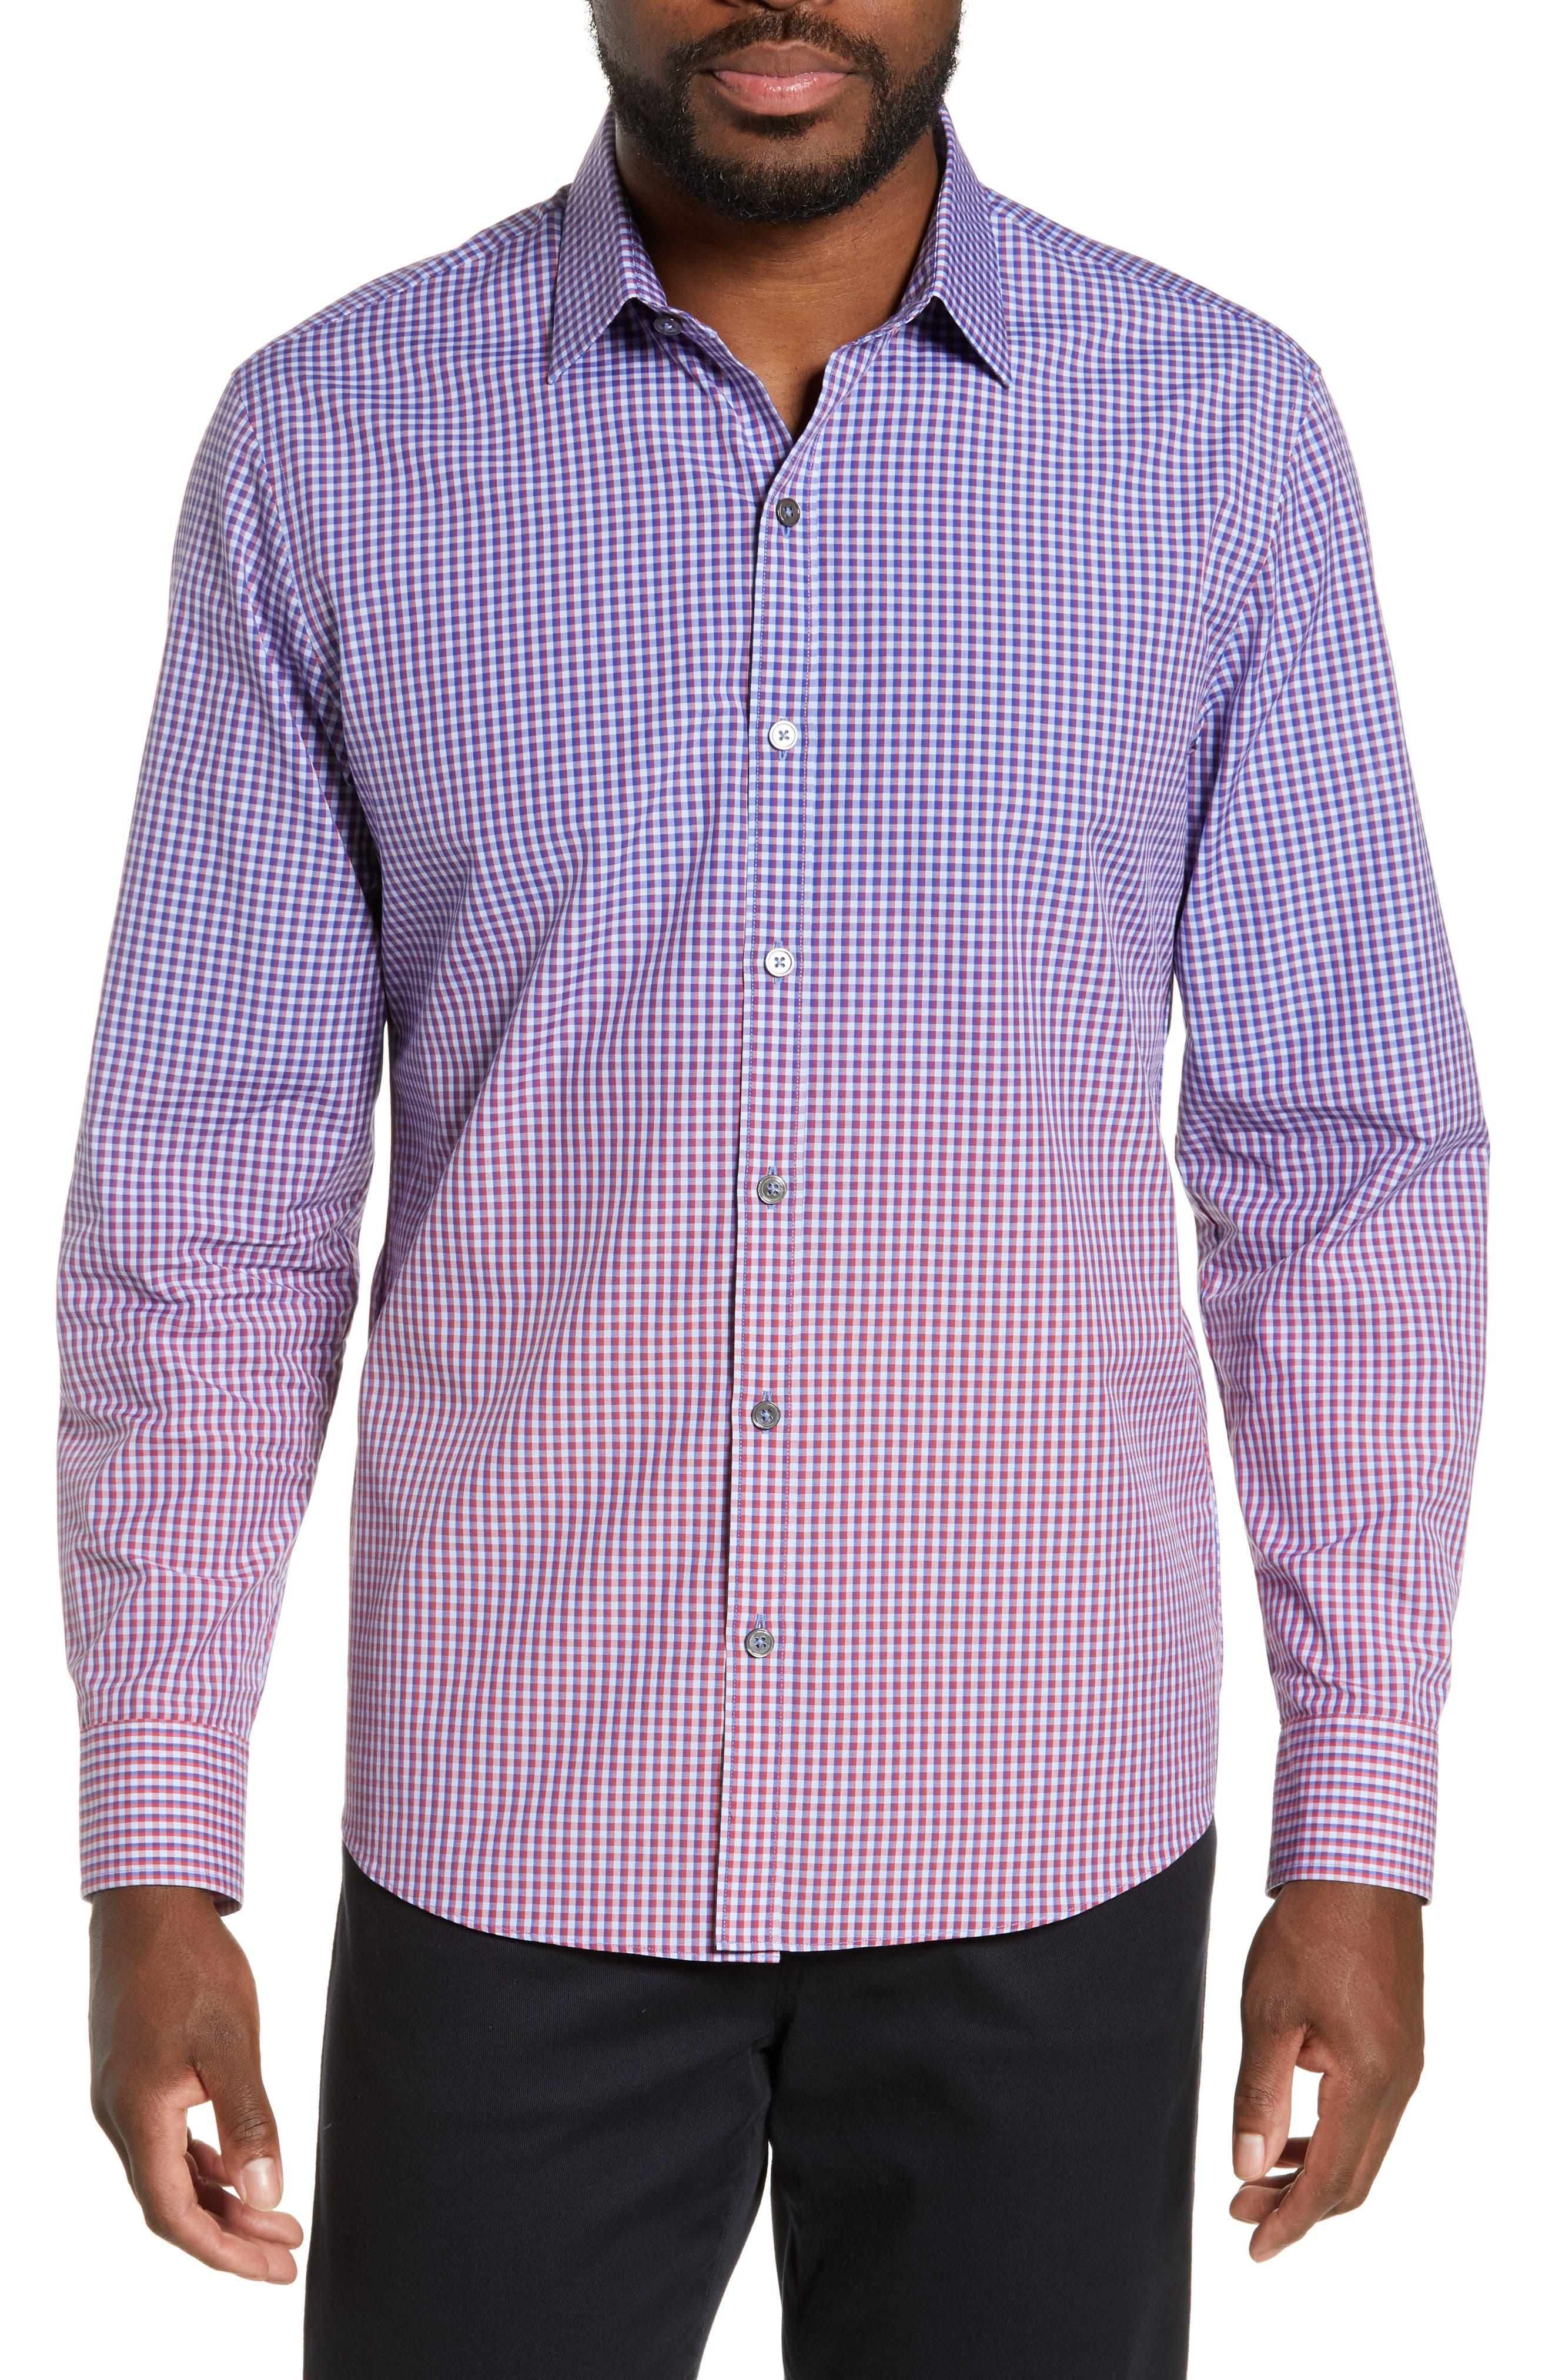 ZACHARY PRELL, Germain Regular Fit Gradient Check Sport Shirt, Main thumbnail 1, color, RED